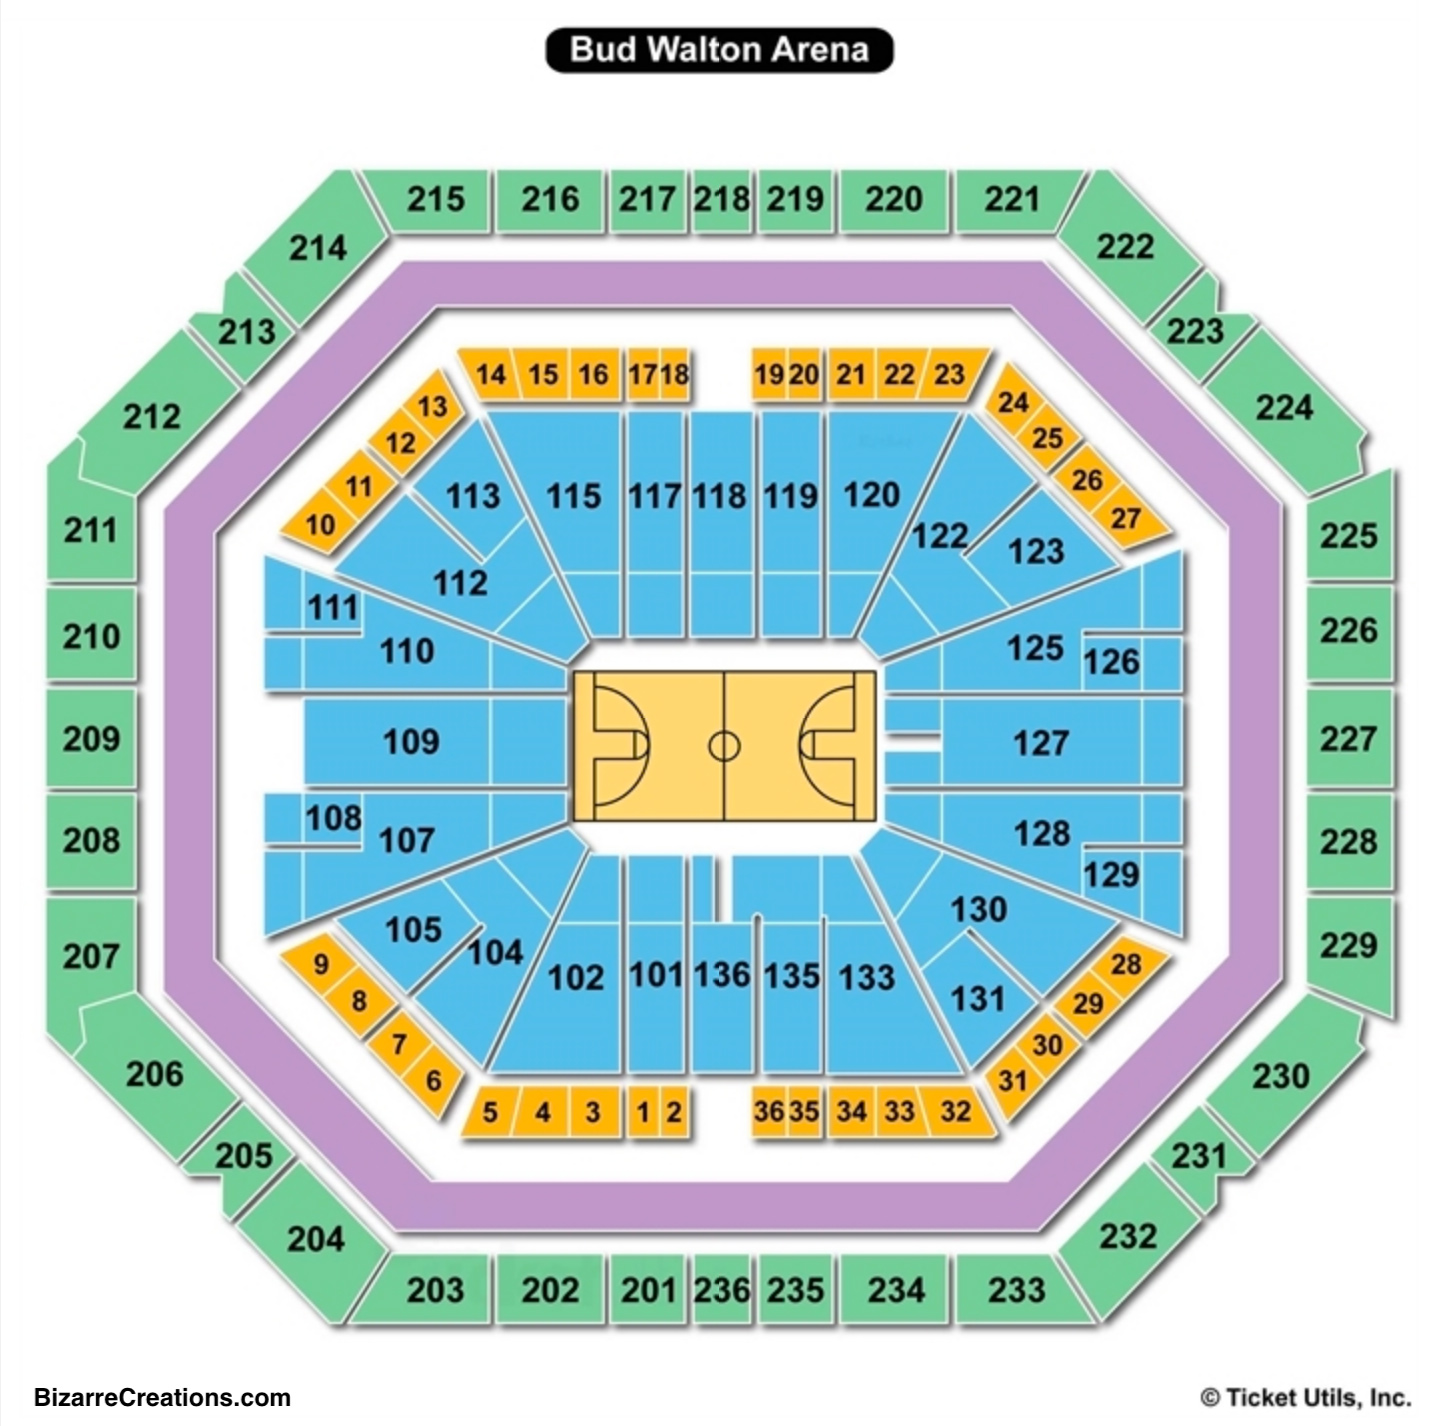 Bud Walton Arena Seating Chart Seating Charts Tickets